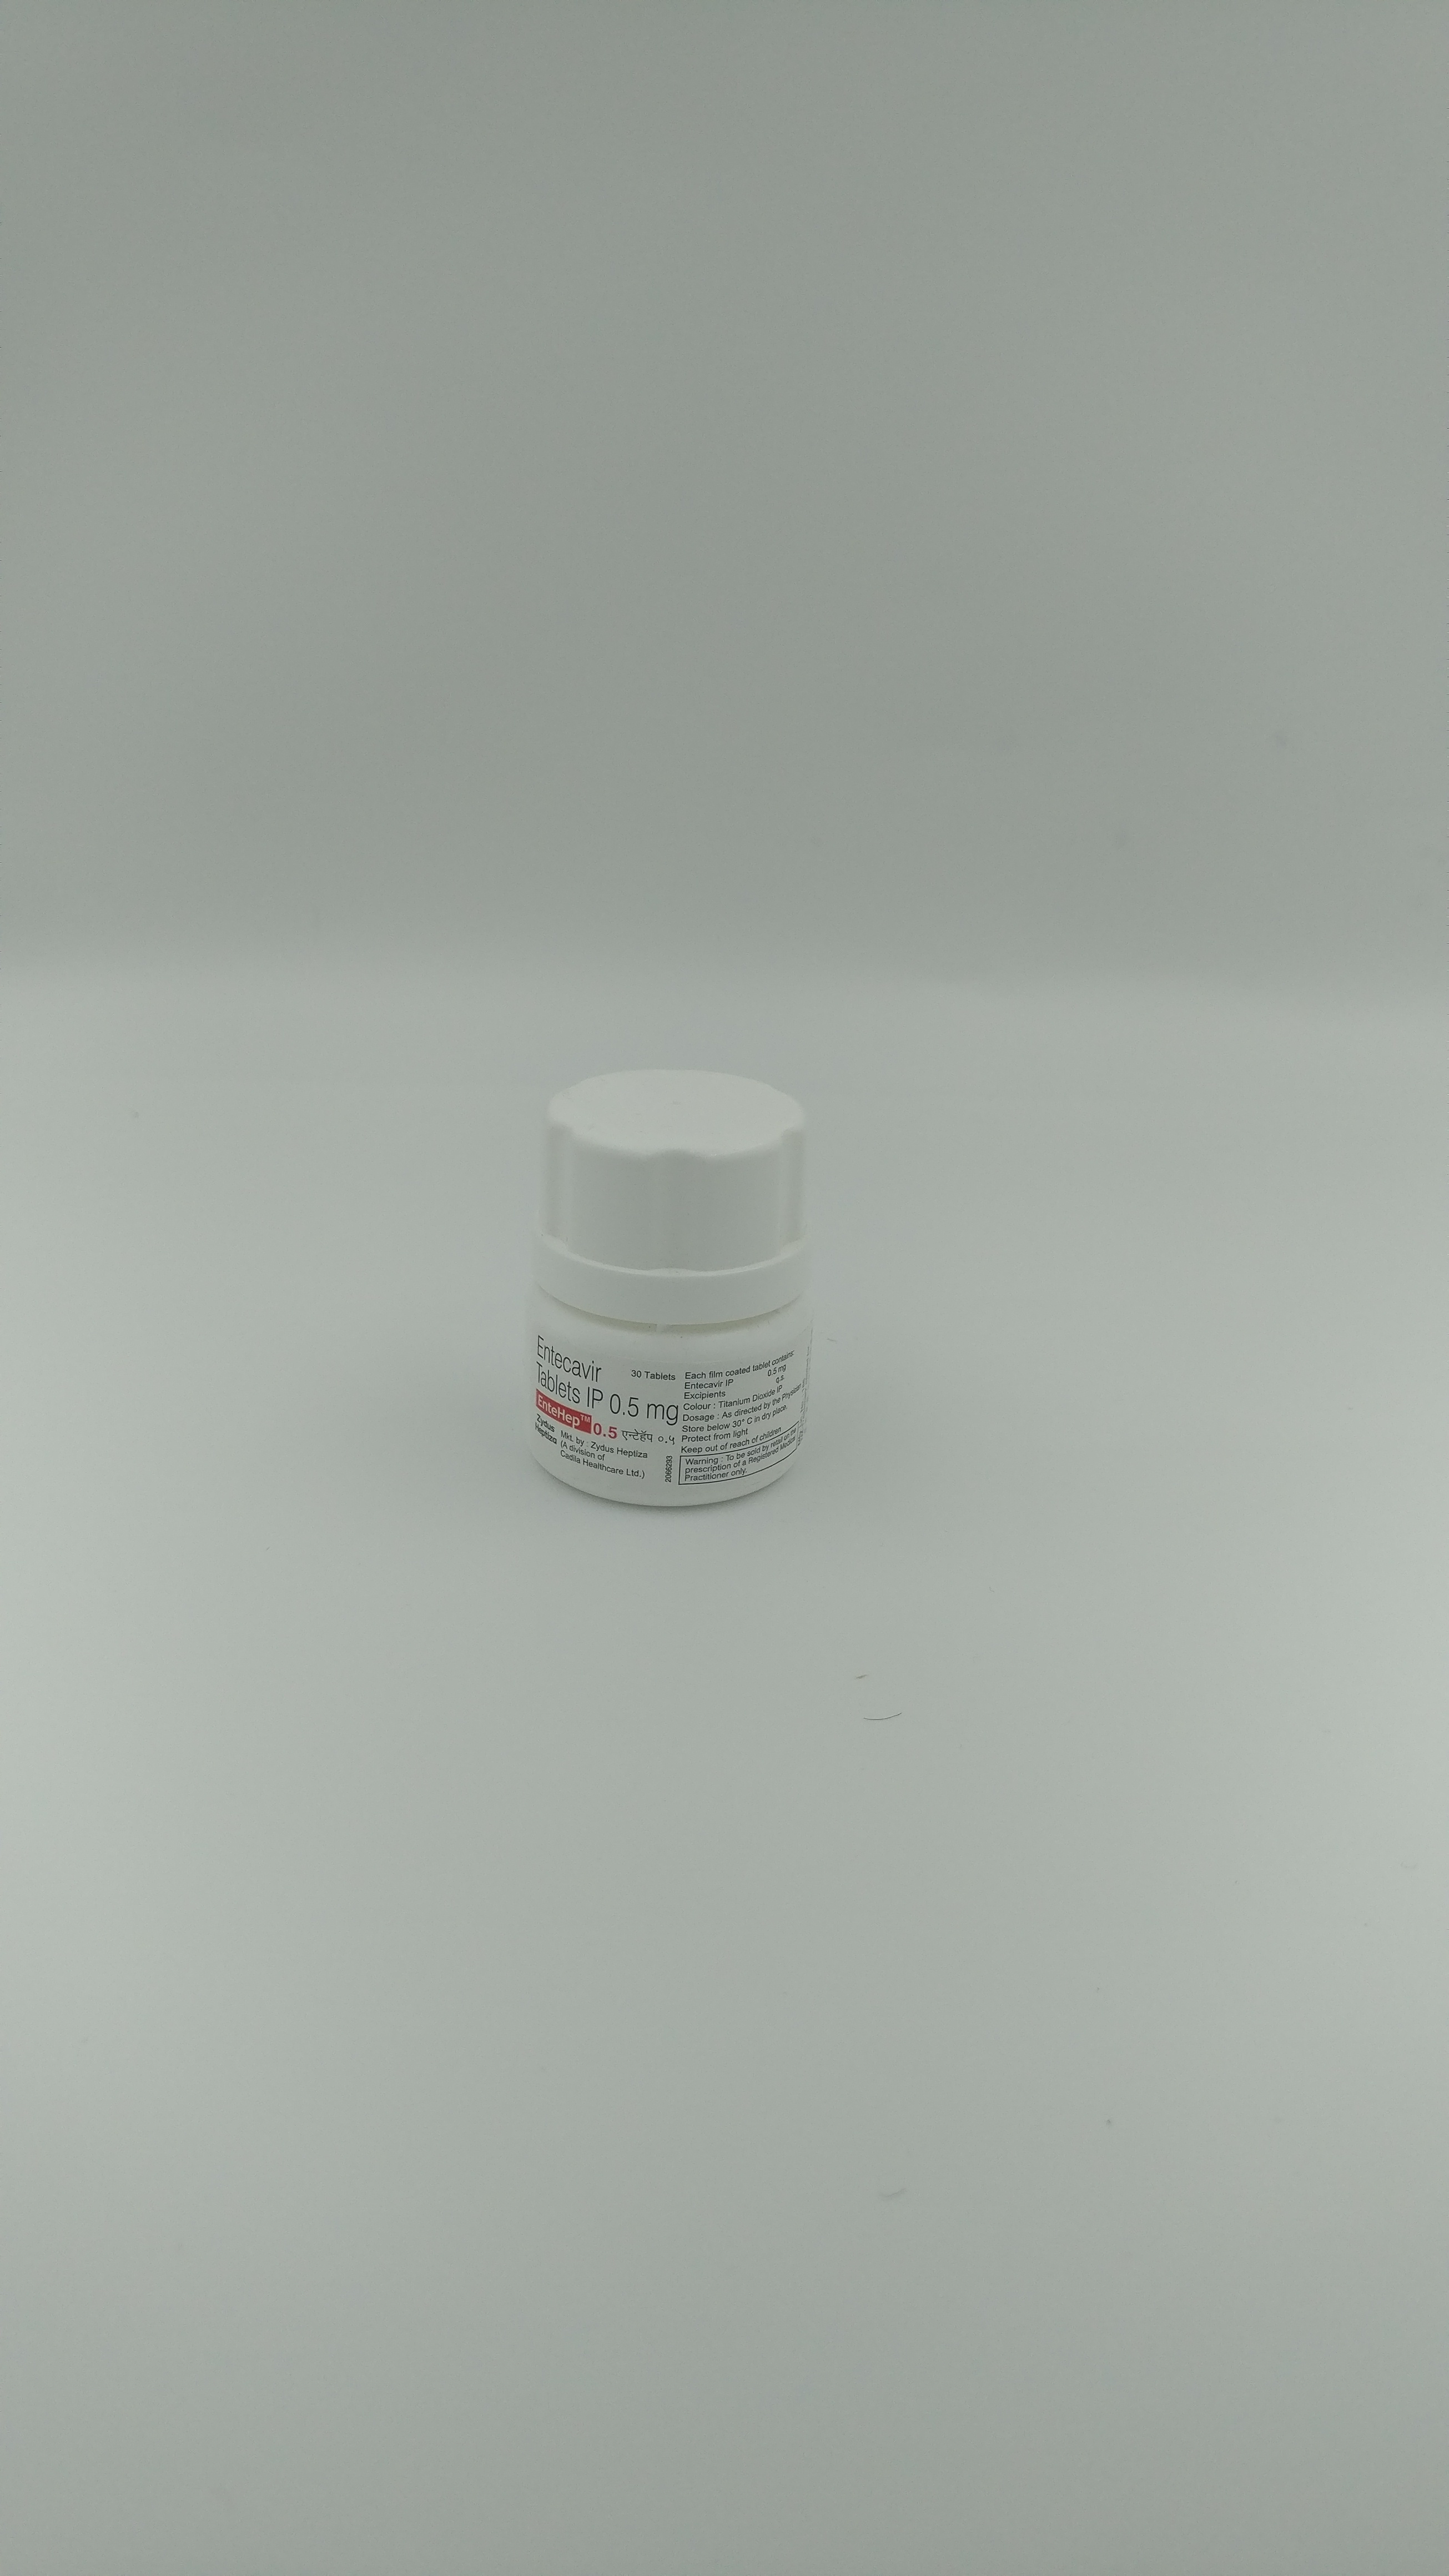 ENTEHEP 0.5 MG Tablet